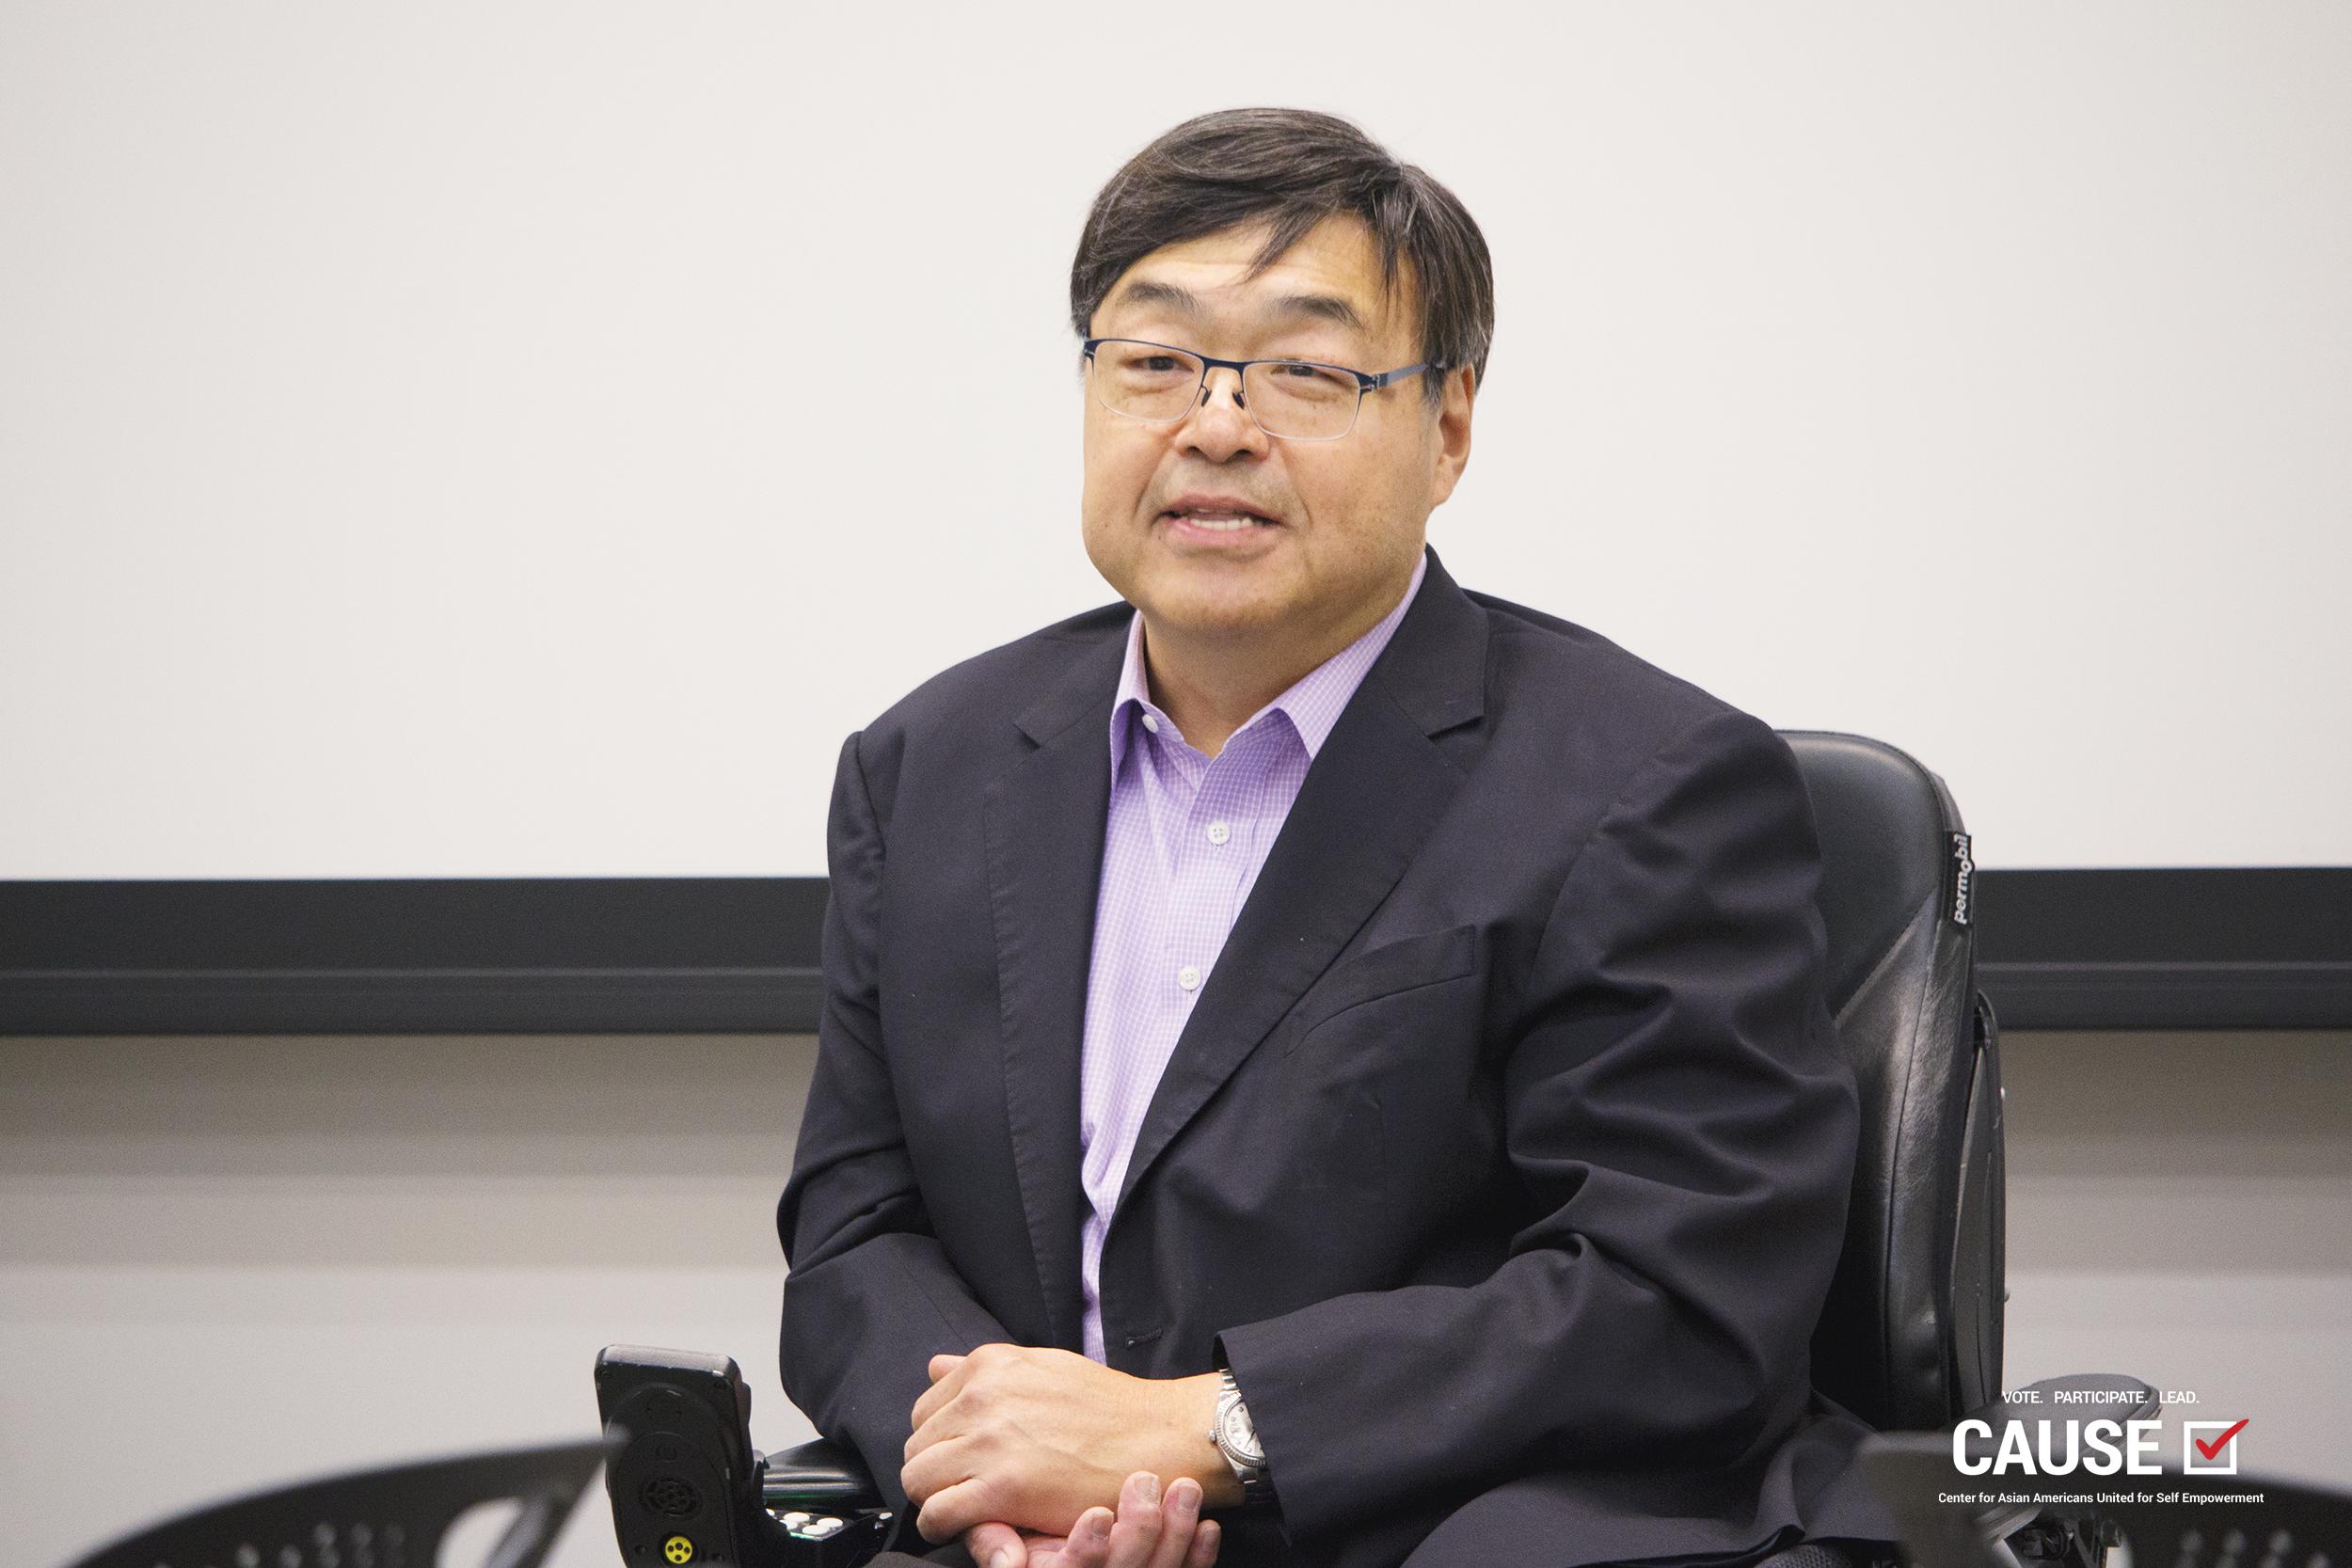 Charlie Woo speaking to the 2019 CAUSE Leadership Institute